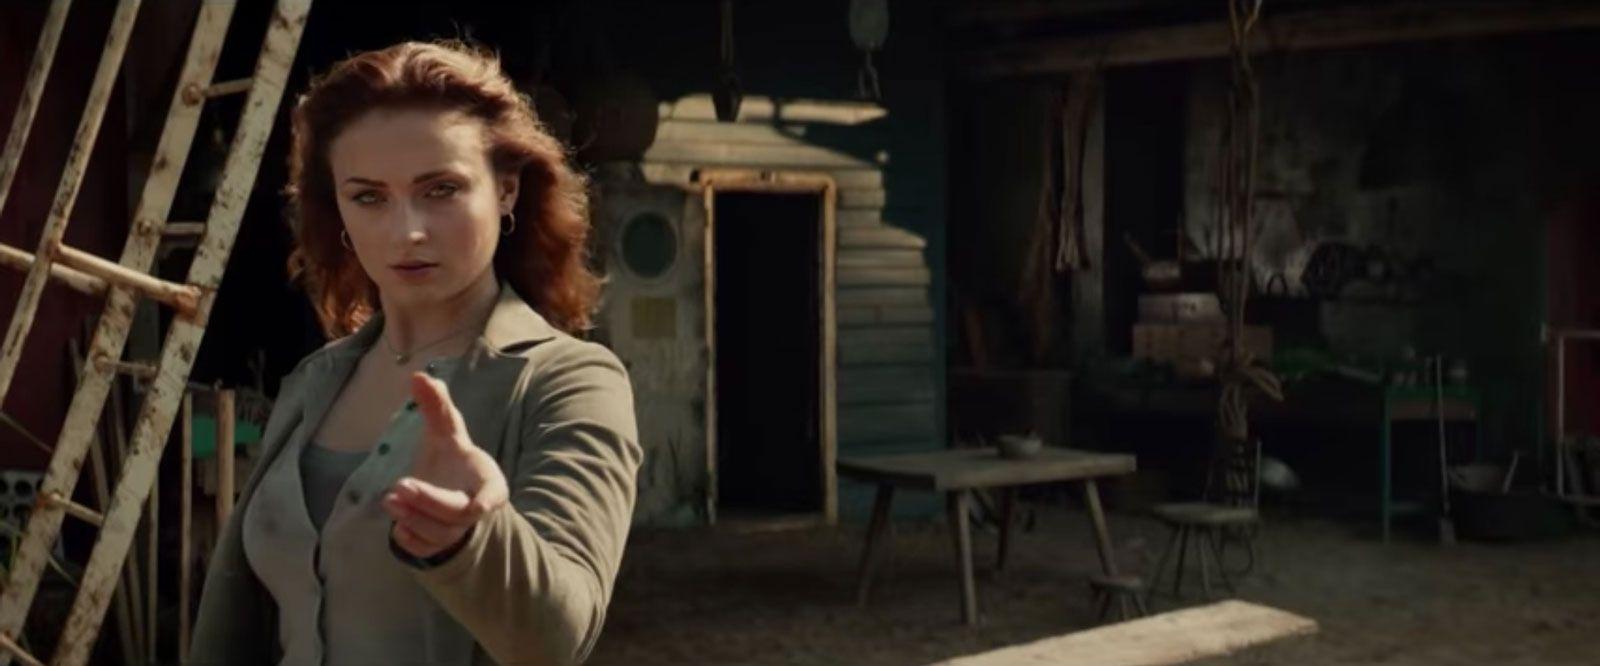 Deadpool 2 Lands New Screenwriter / Deadpool 2 Shooting Start Date Revealed.